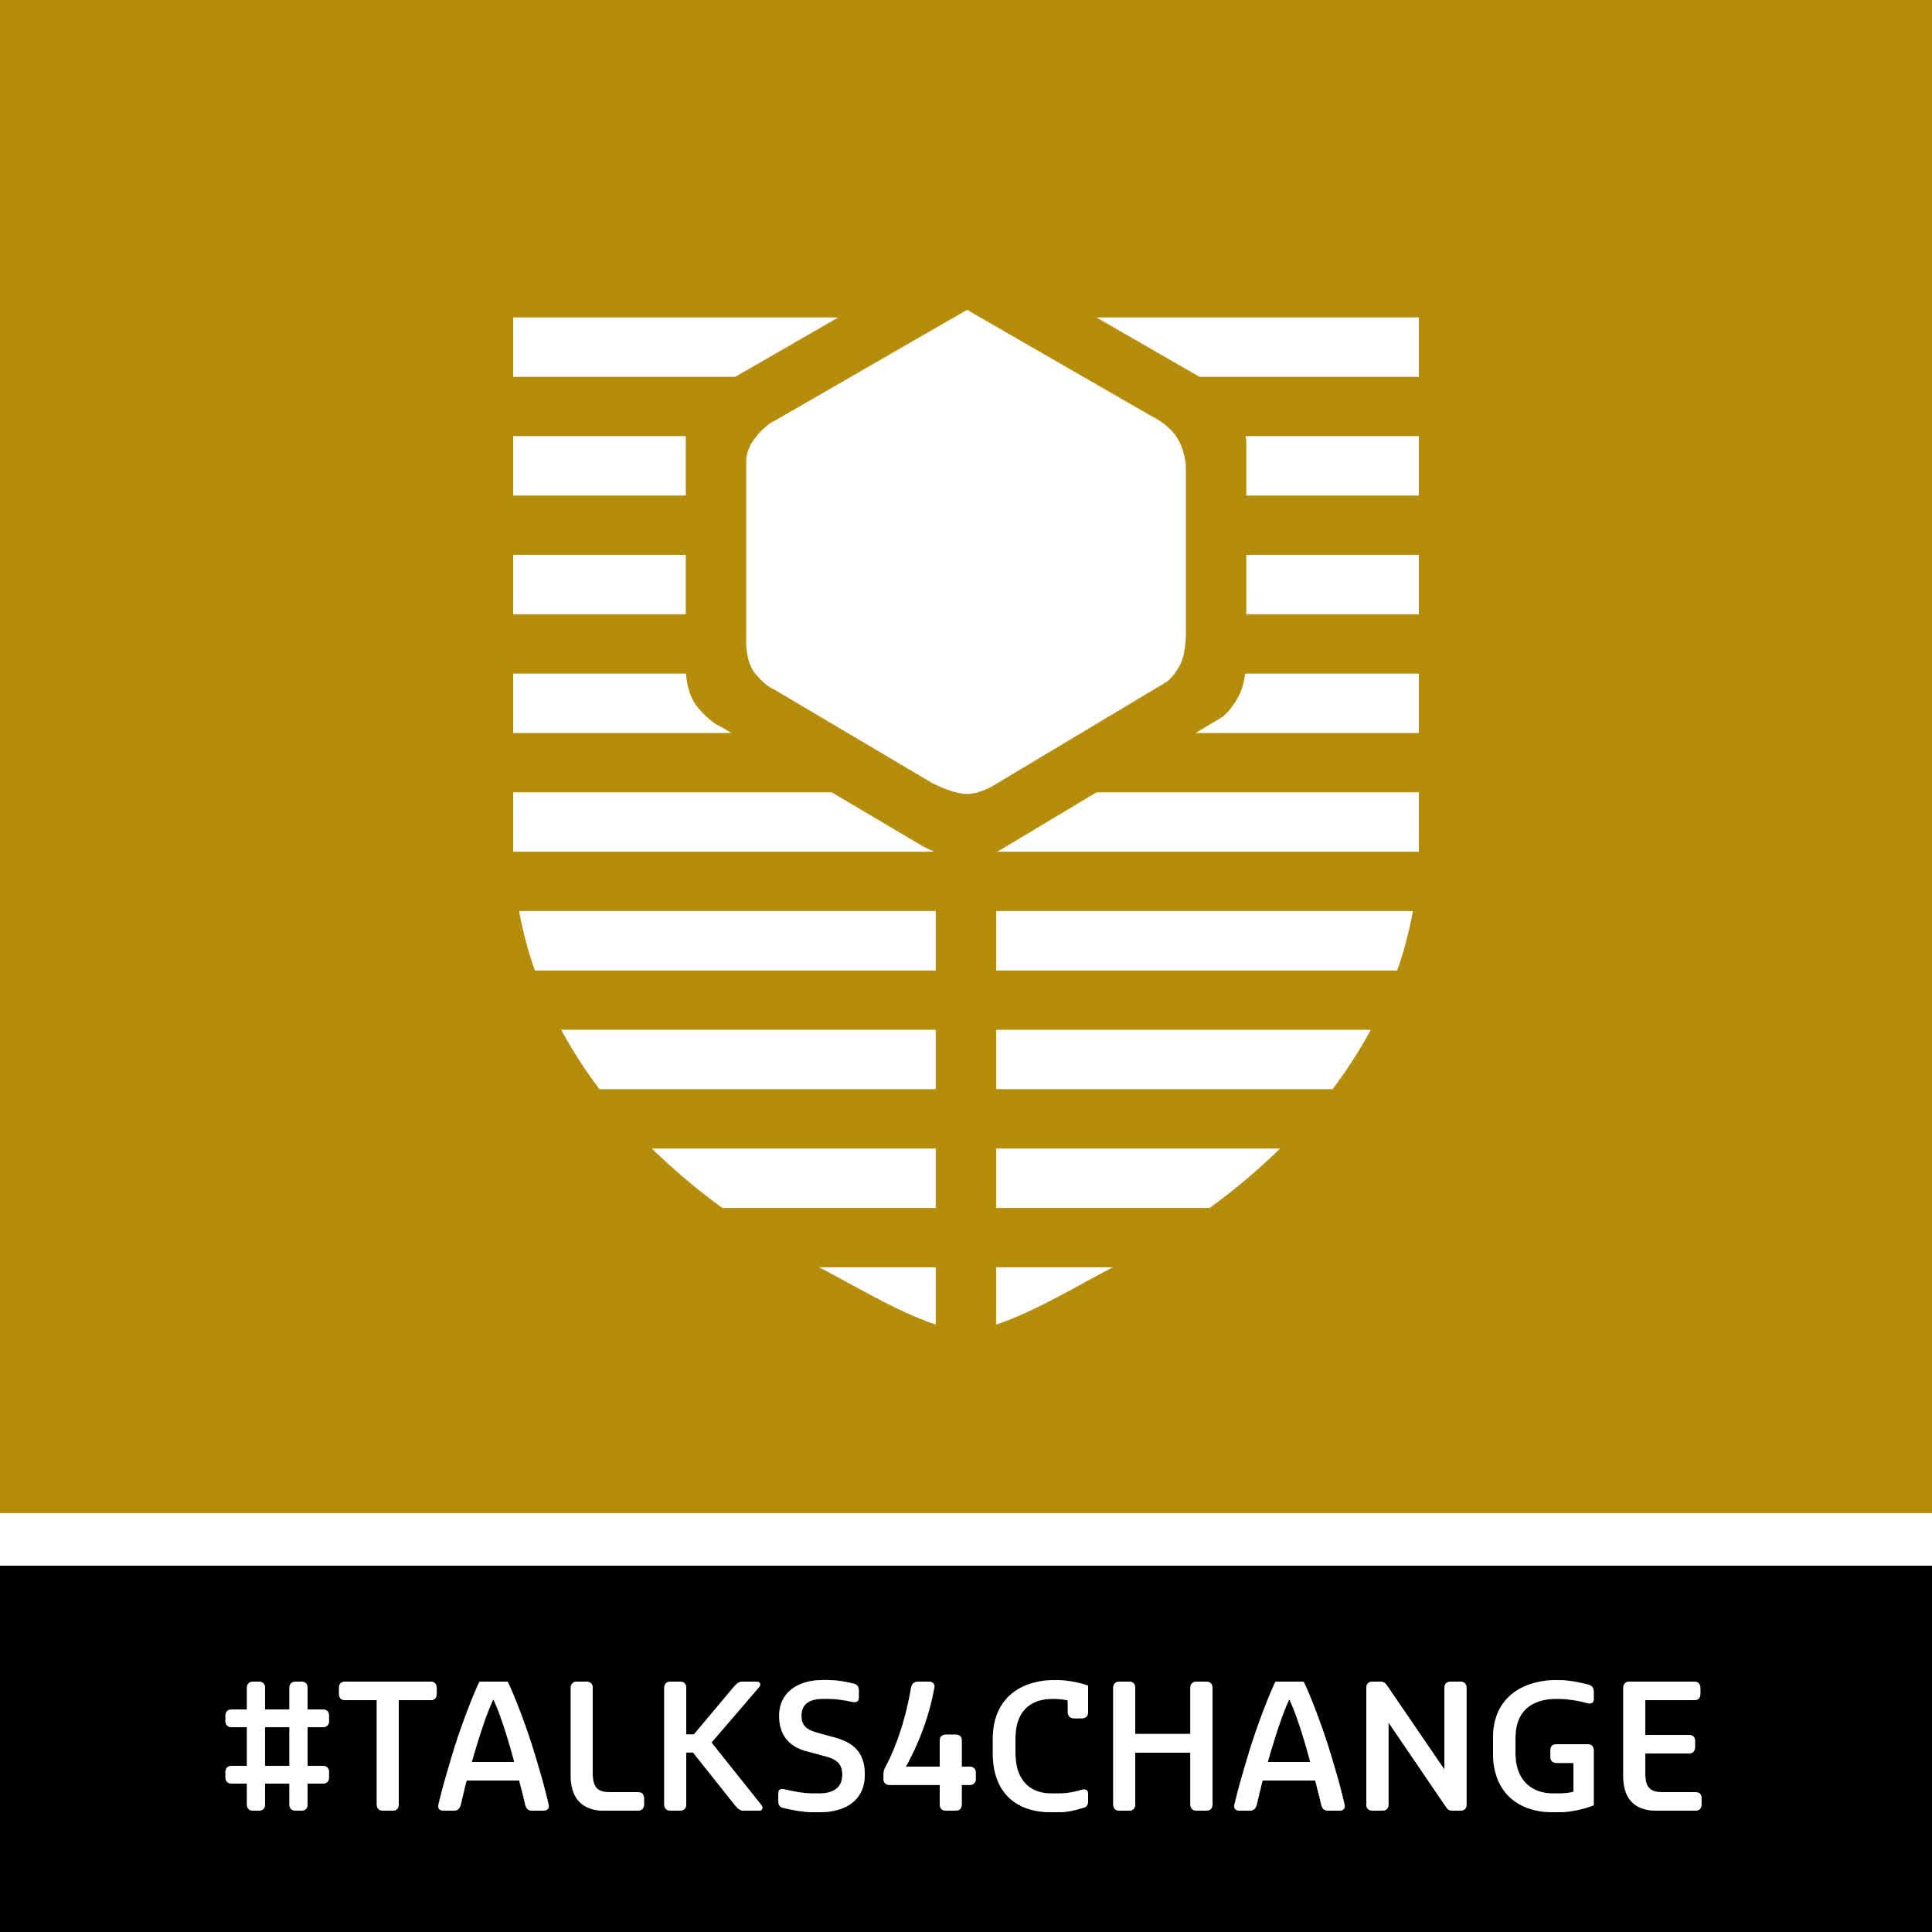 #Talks4Change